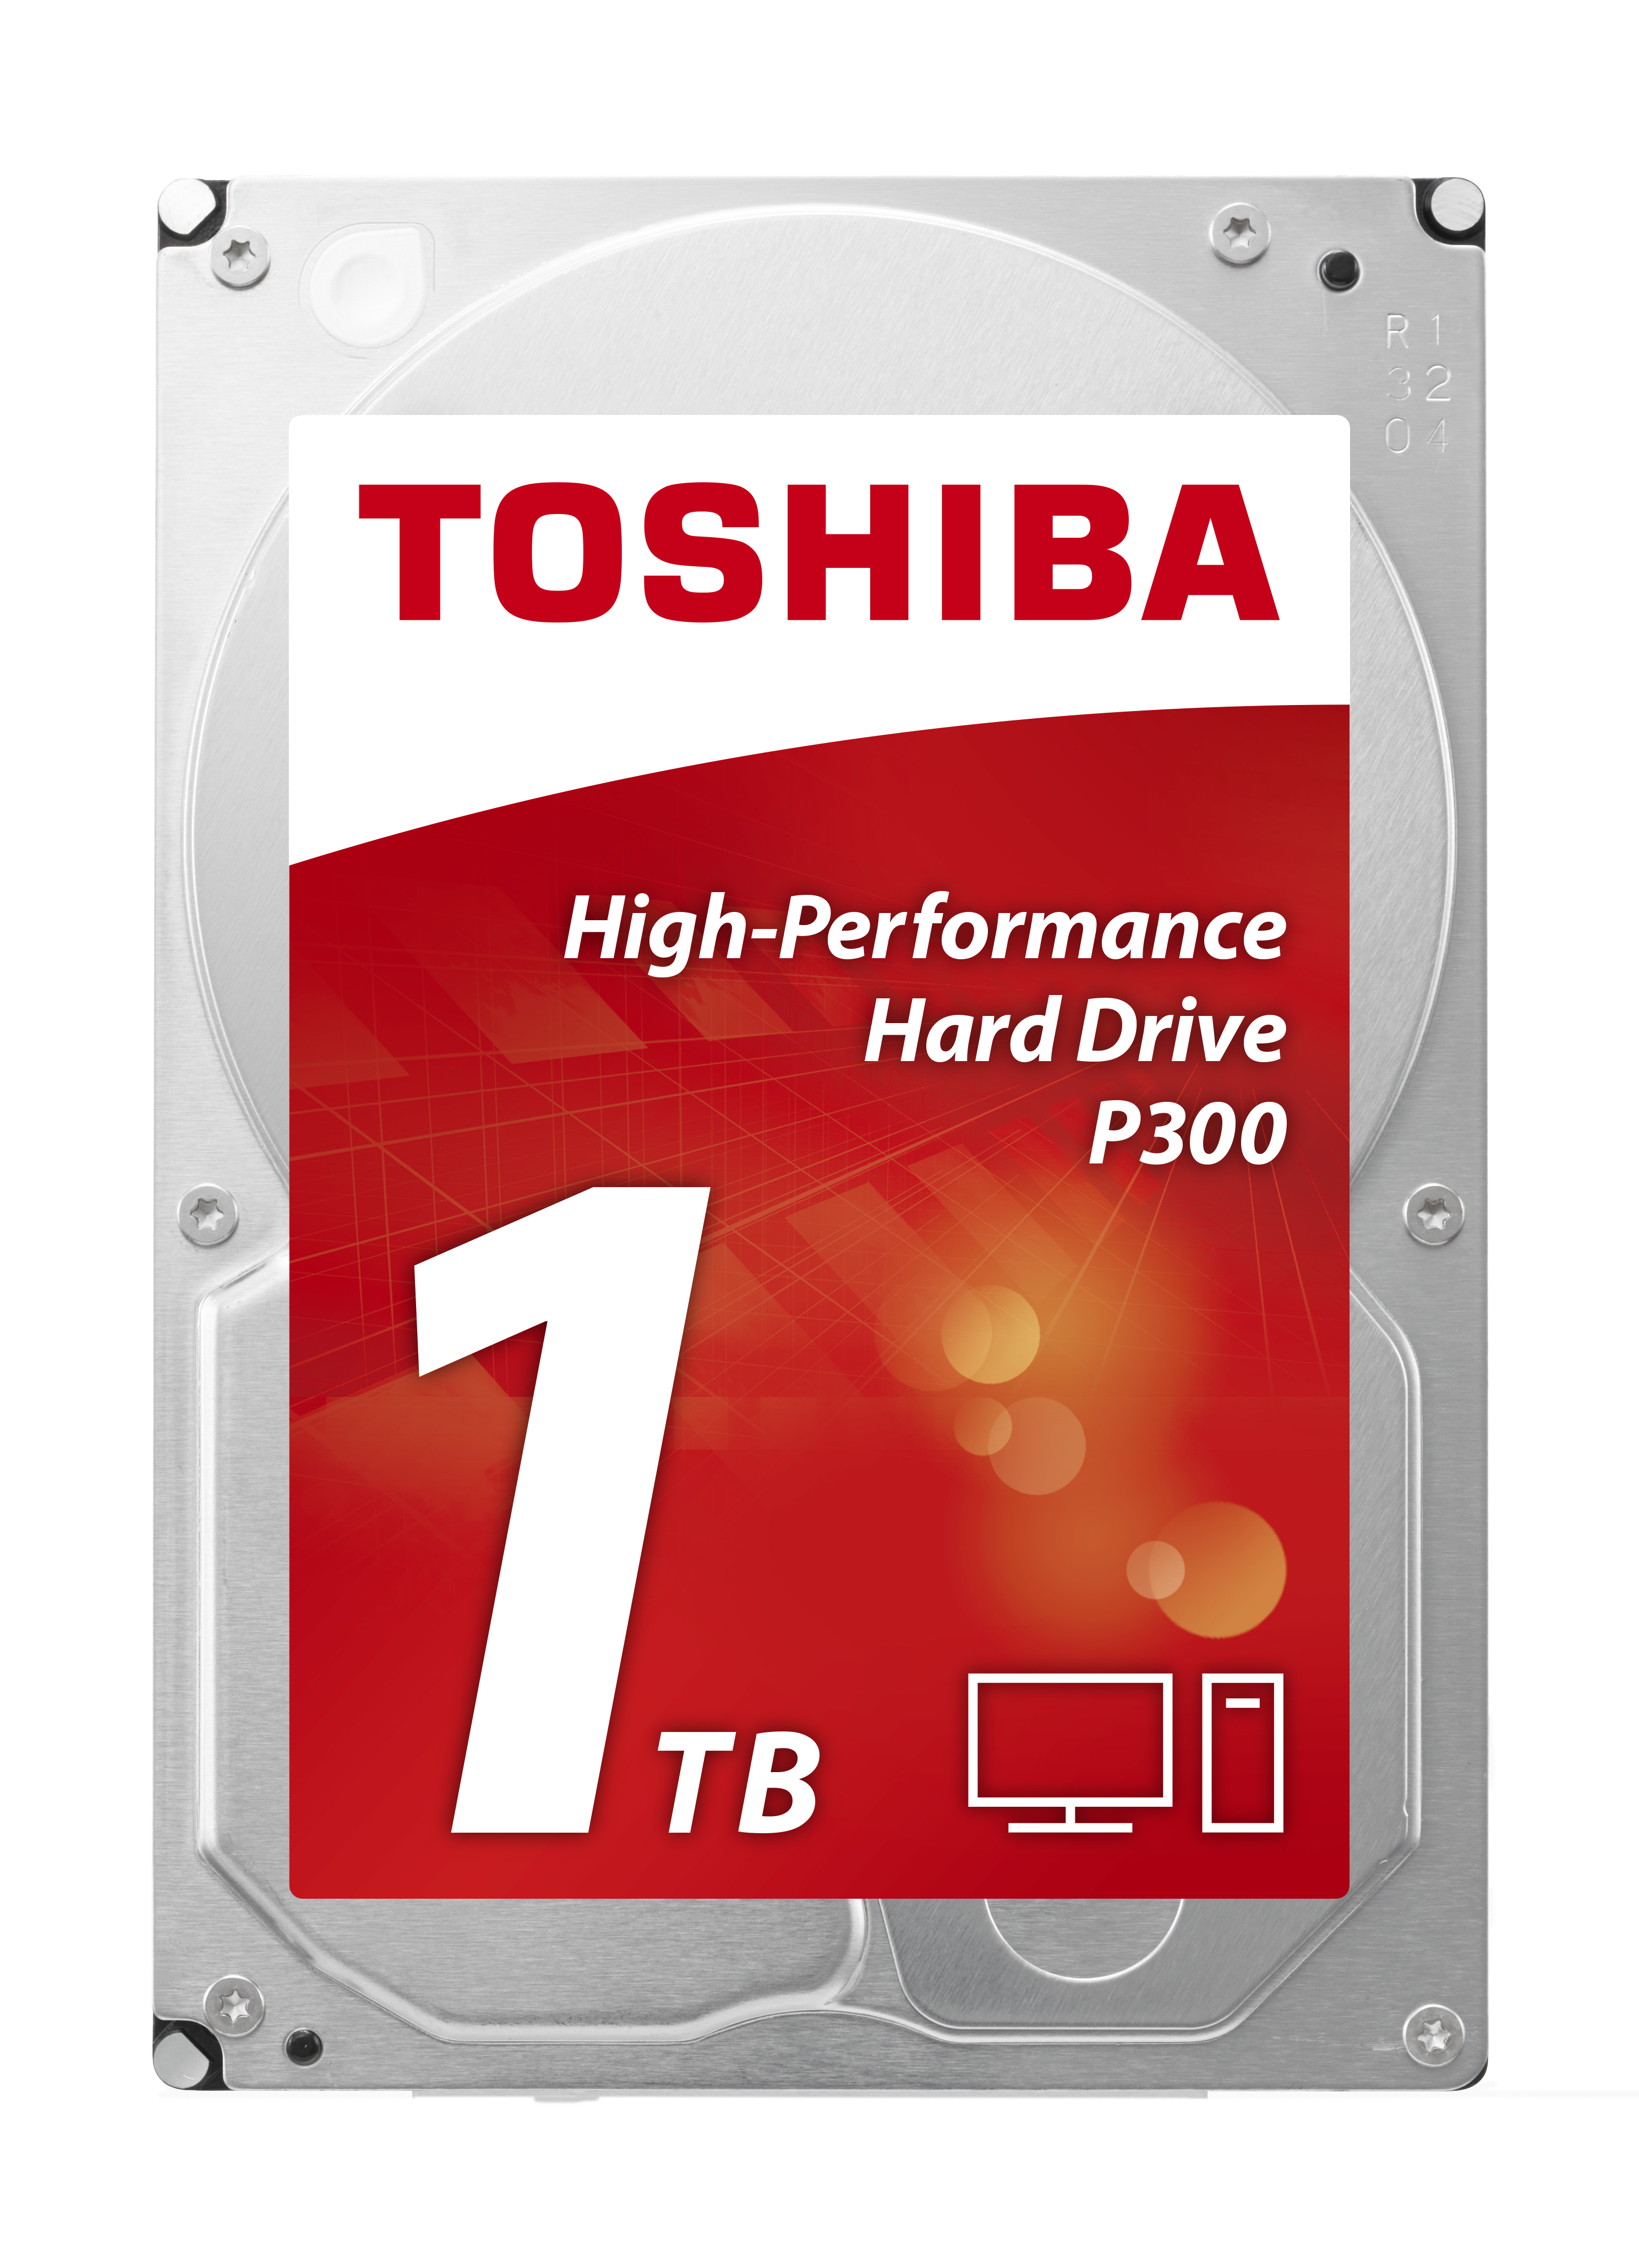 Toshiba P300 3.5 SATA6GBS HDD, 1 TB, 7200 rpm, 32 MB Cache